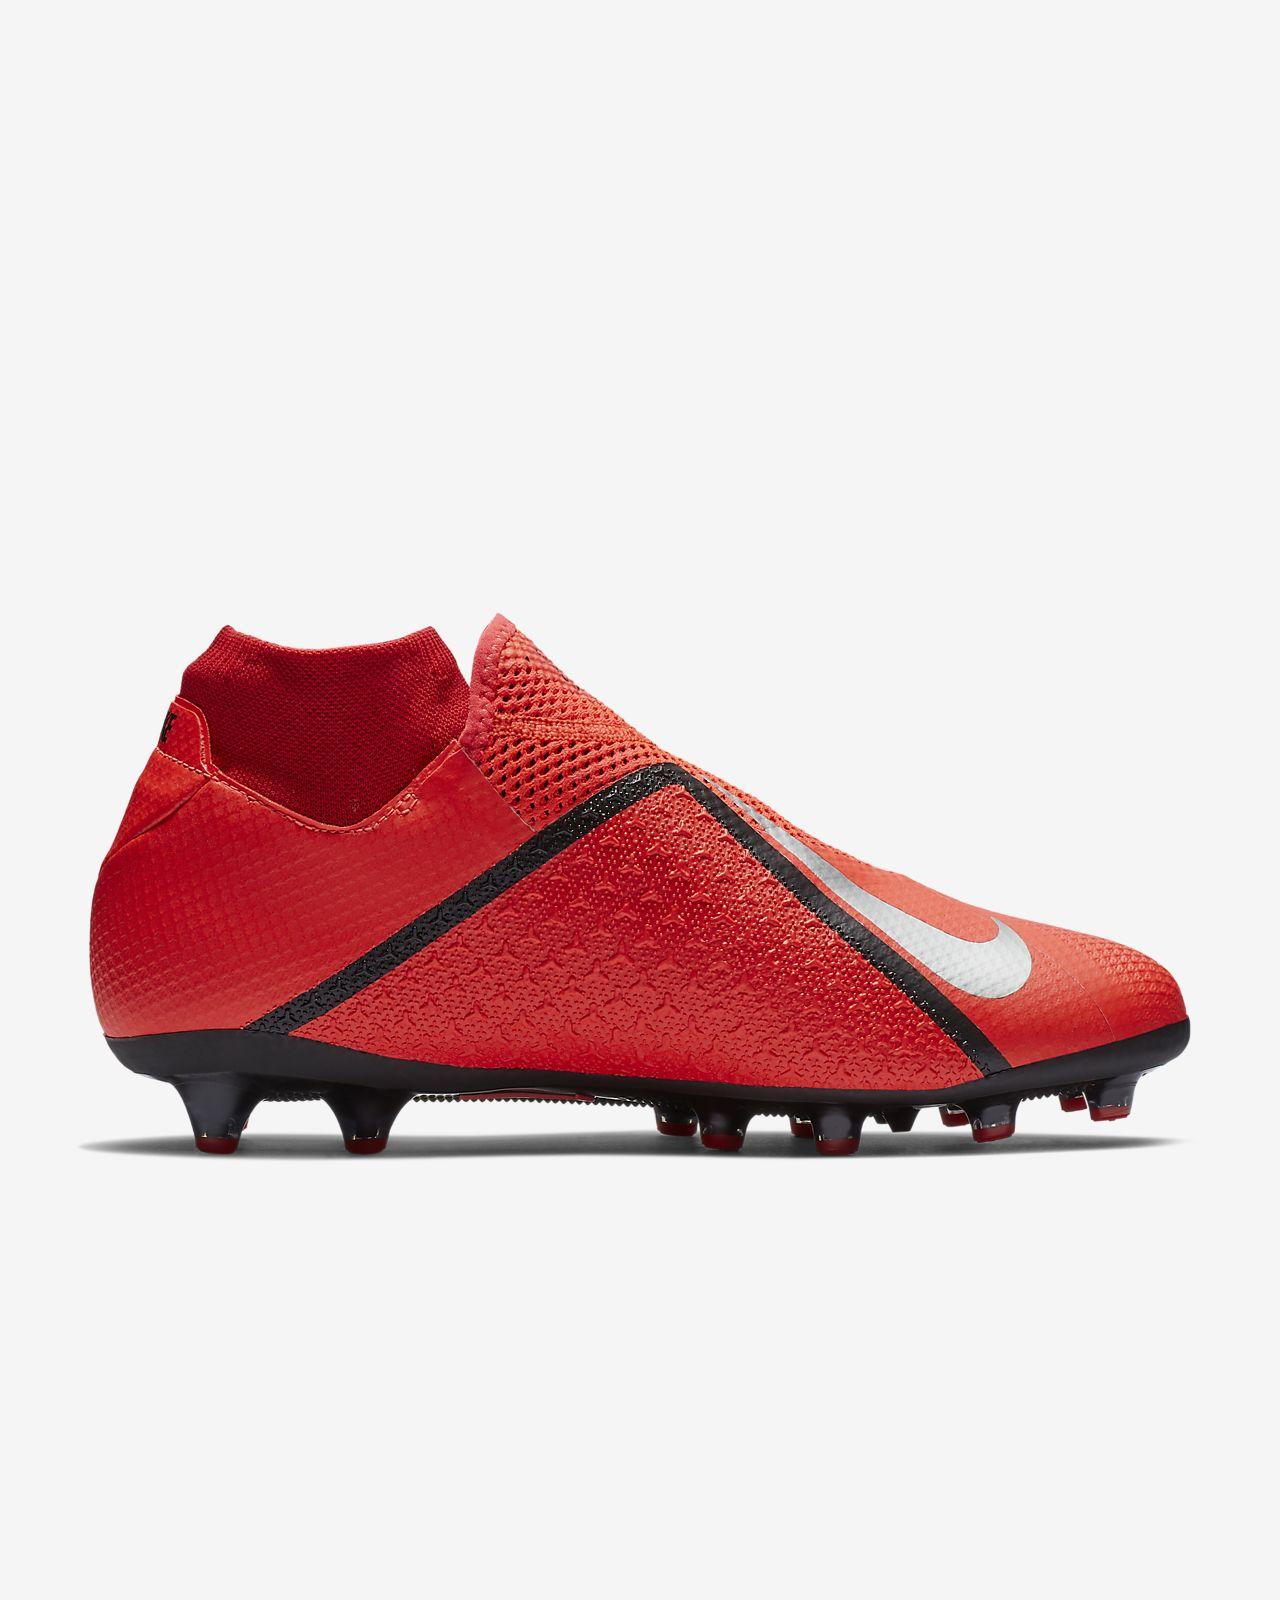 ... Calzado de fútbol para pasto artificial Nike Phantom Vision Pro Dynamic  Fit AG-PRO 5fa1c13d2dac5